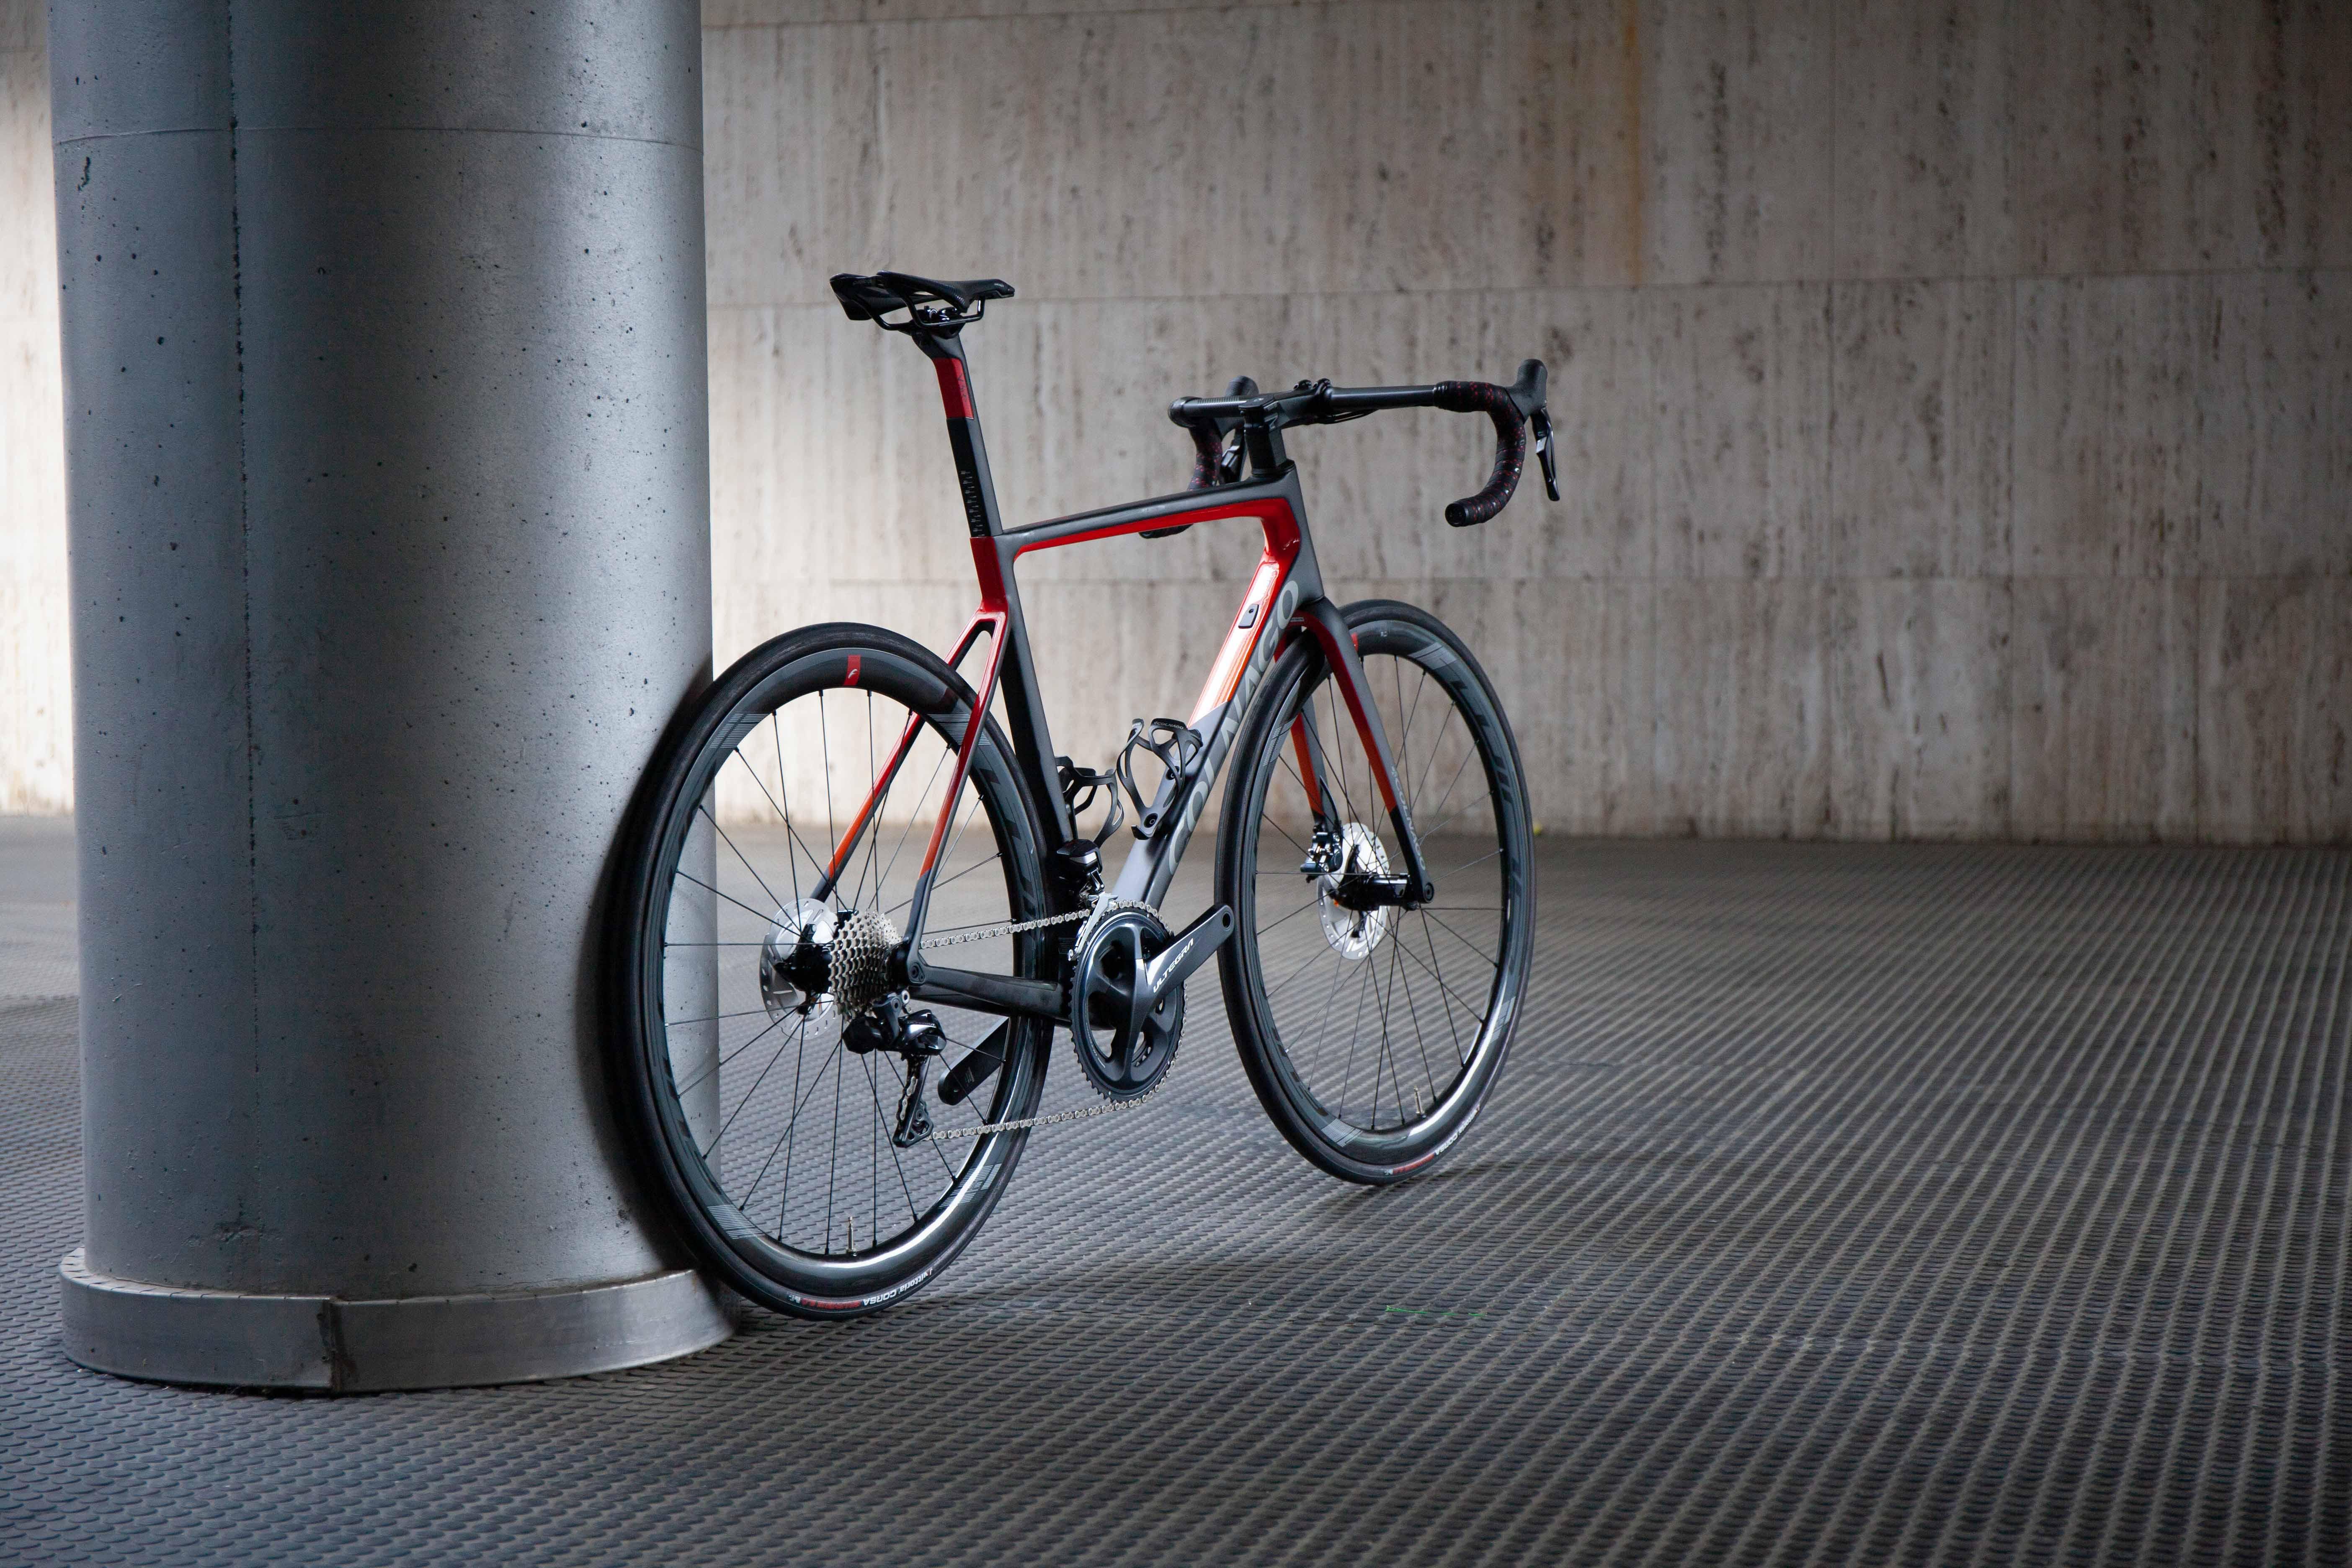 Cicli Corsa Colnago V3Rs Disc 52 ultegra-3